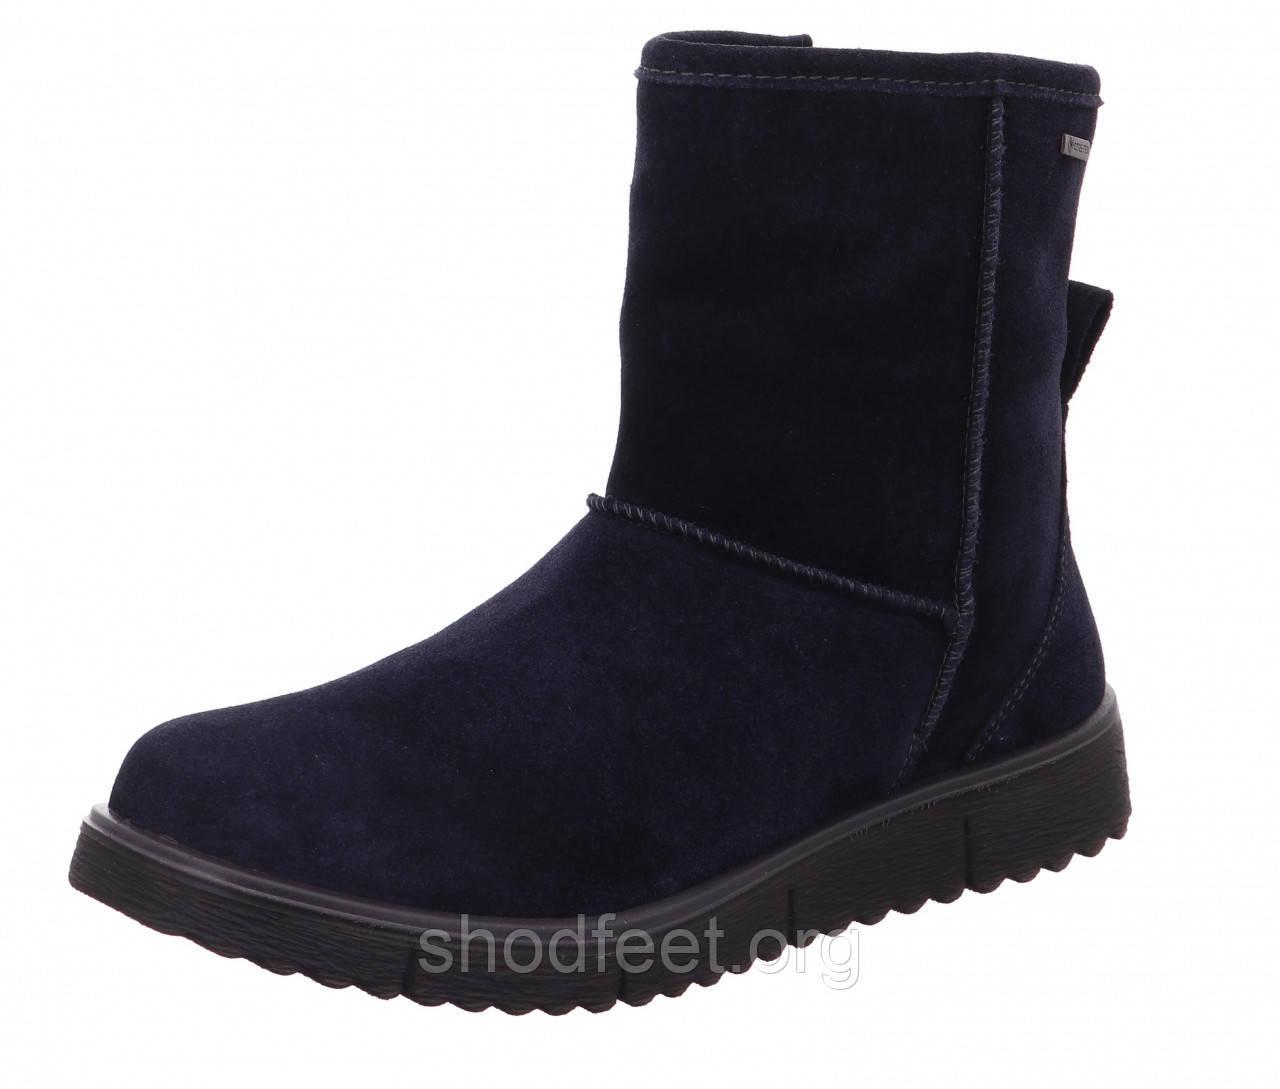 Женские ботинки Legero Campania Gore-Tex 2-000654-8000